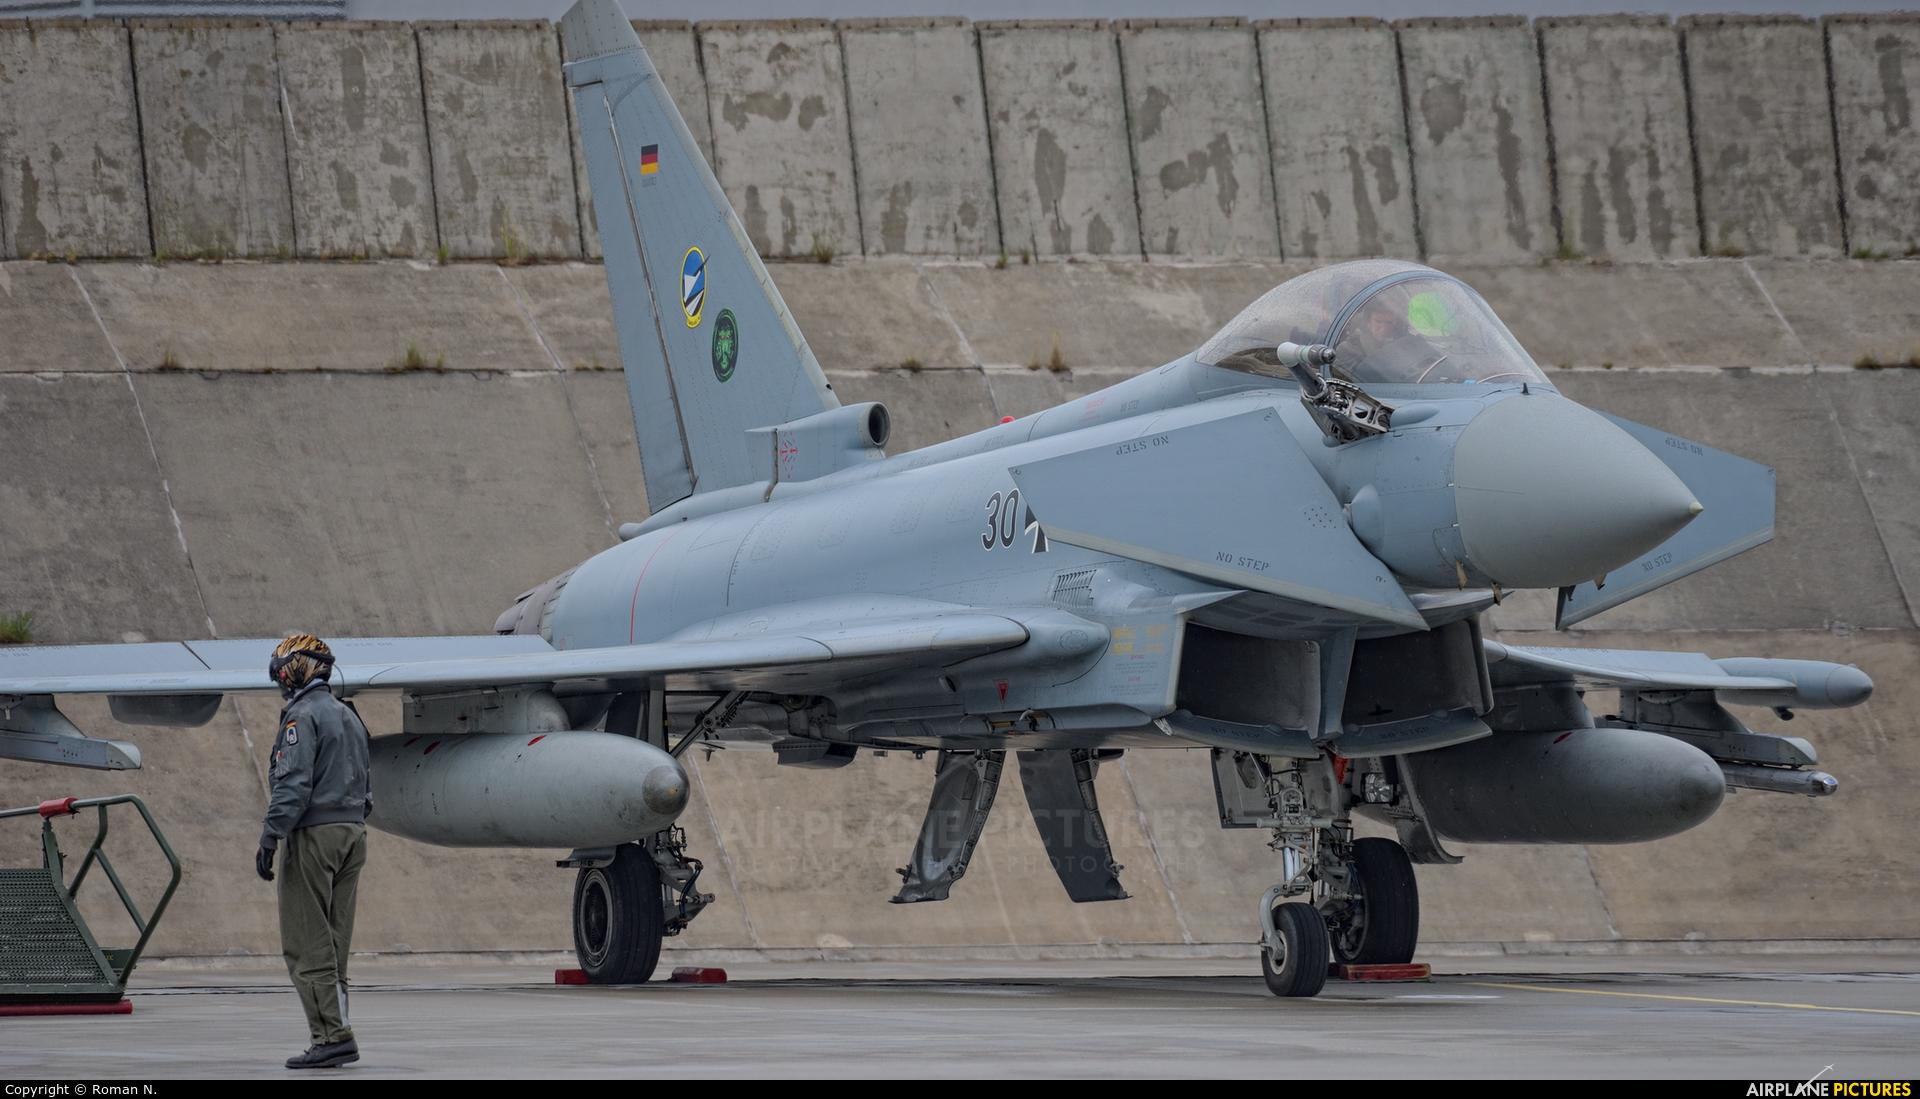 Germany - Air Force 30+53 aircraft at Poznań - Krzesiny